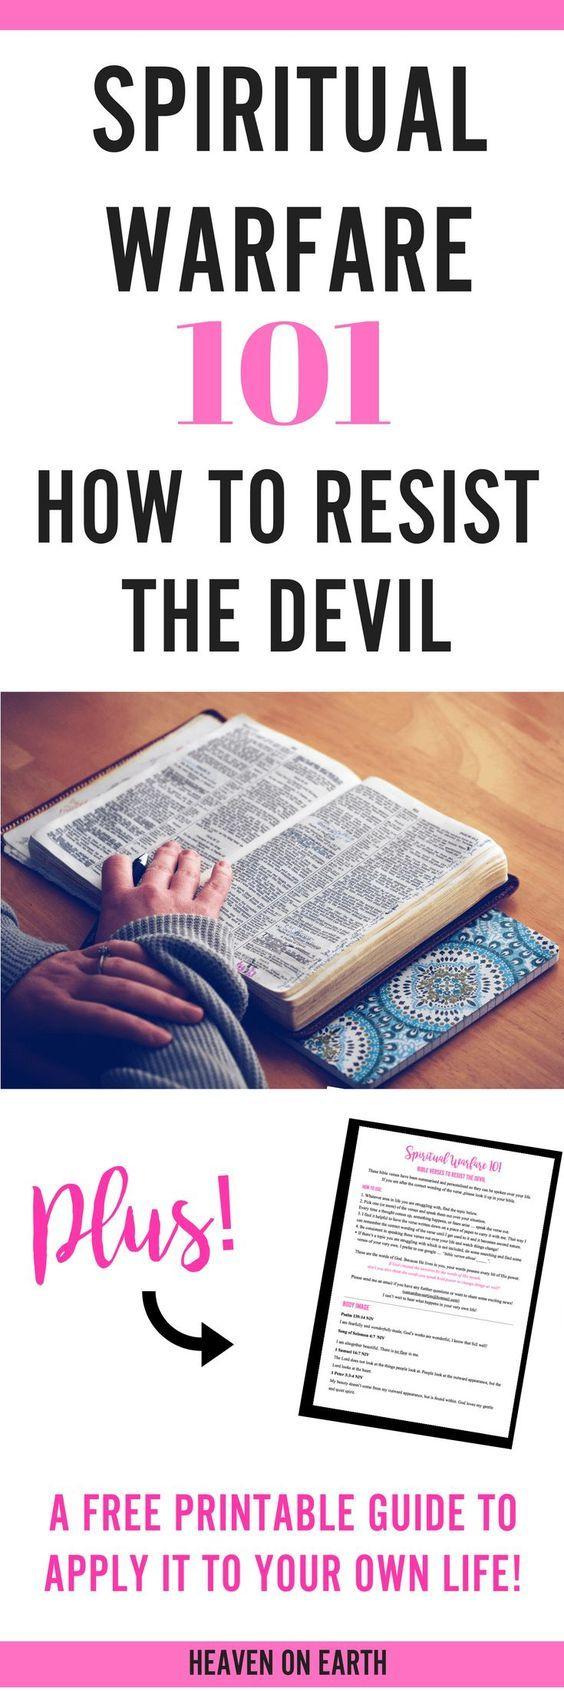 Spiritual Warfare 101 How To Resist The Devil